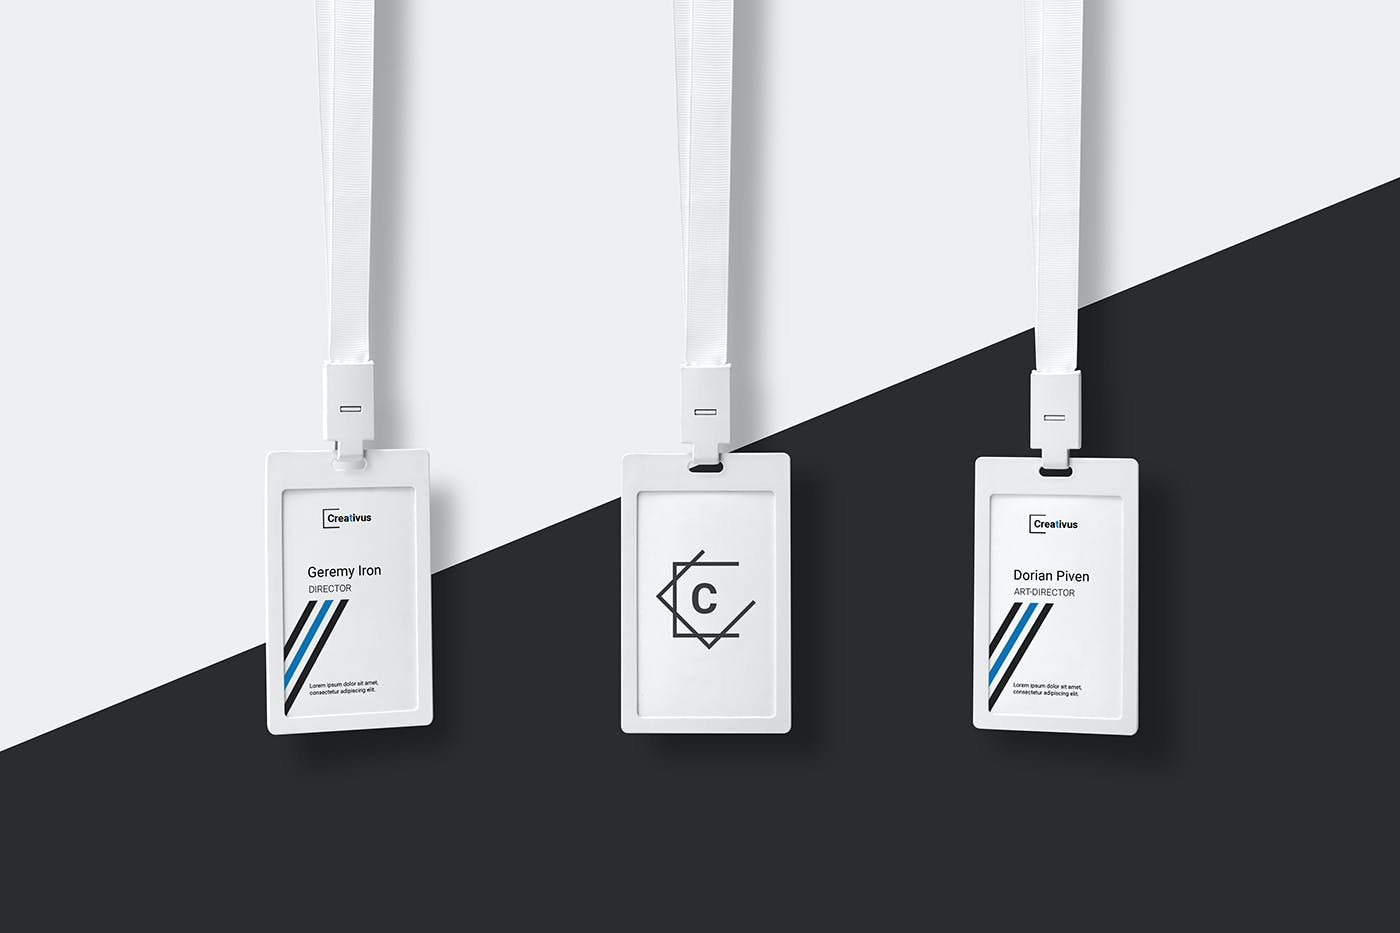 7款品牌LOGO设计办公用品展示贴图样机 Branding Stationery Mockup插图(5)